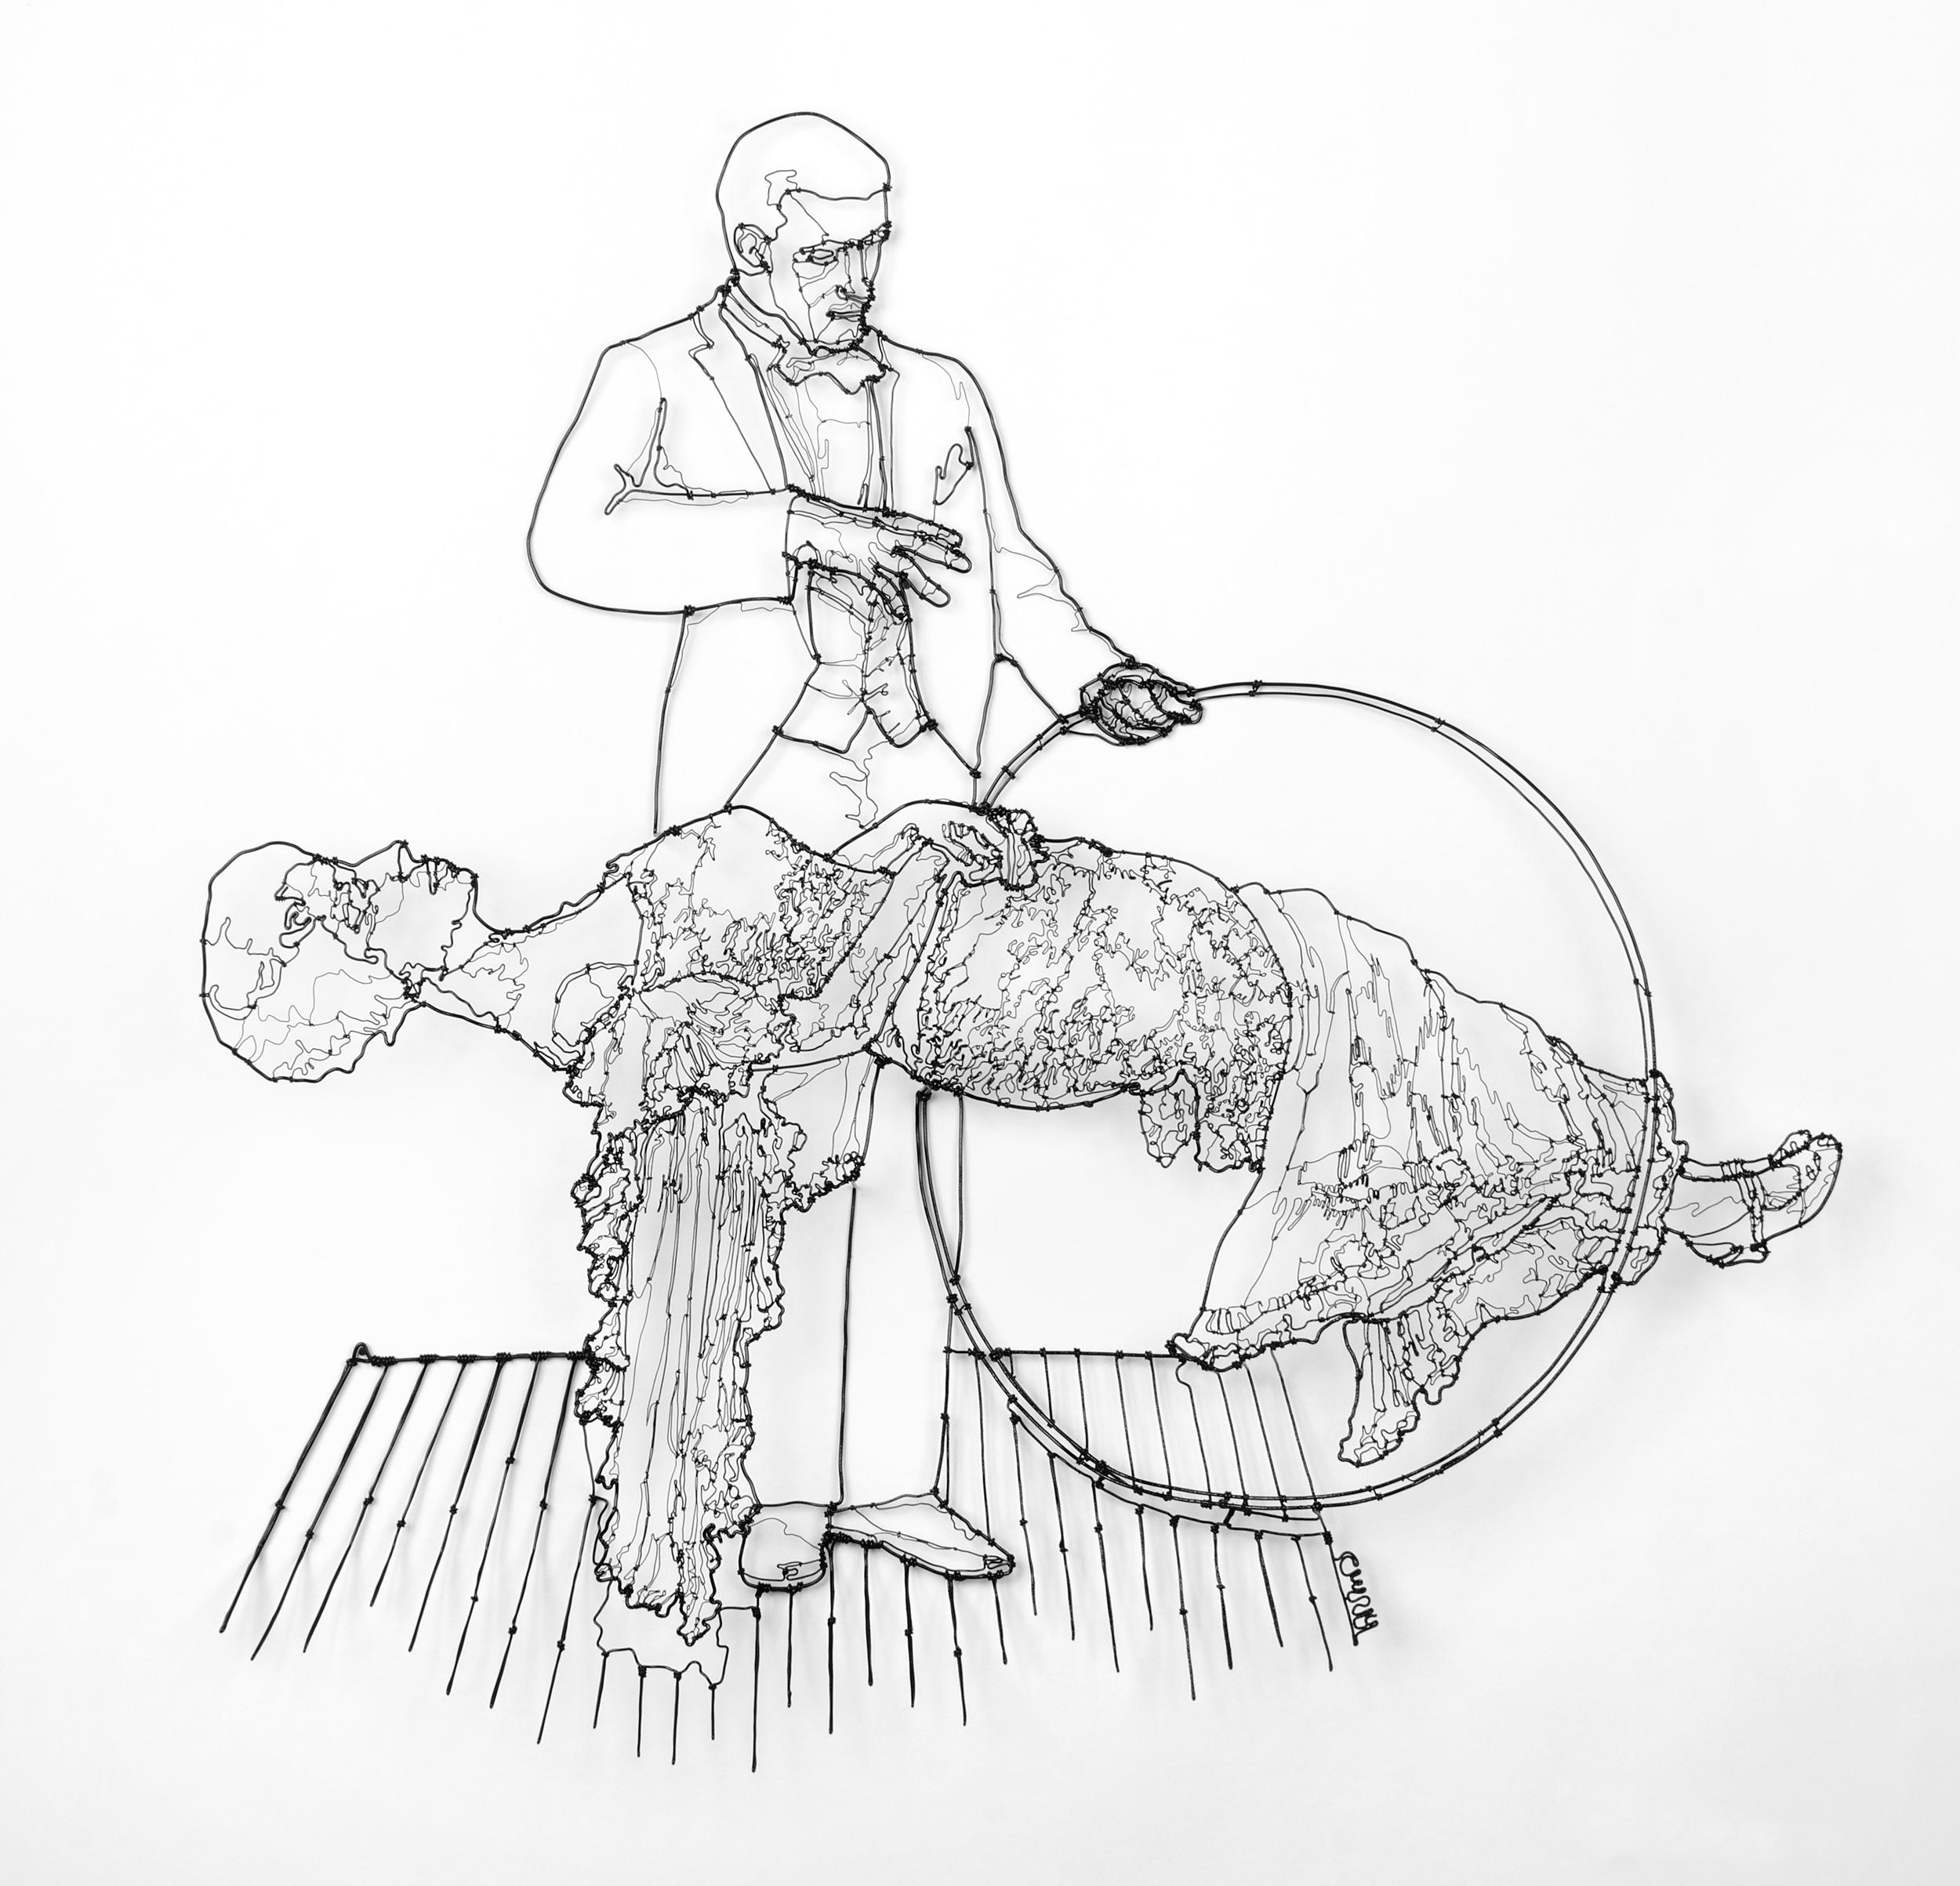 Performing a Levitation Illusion